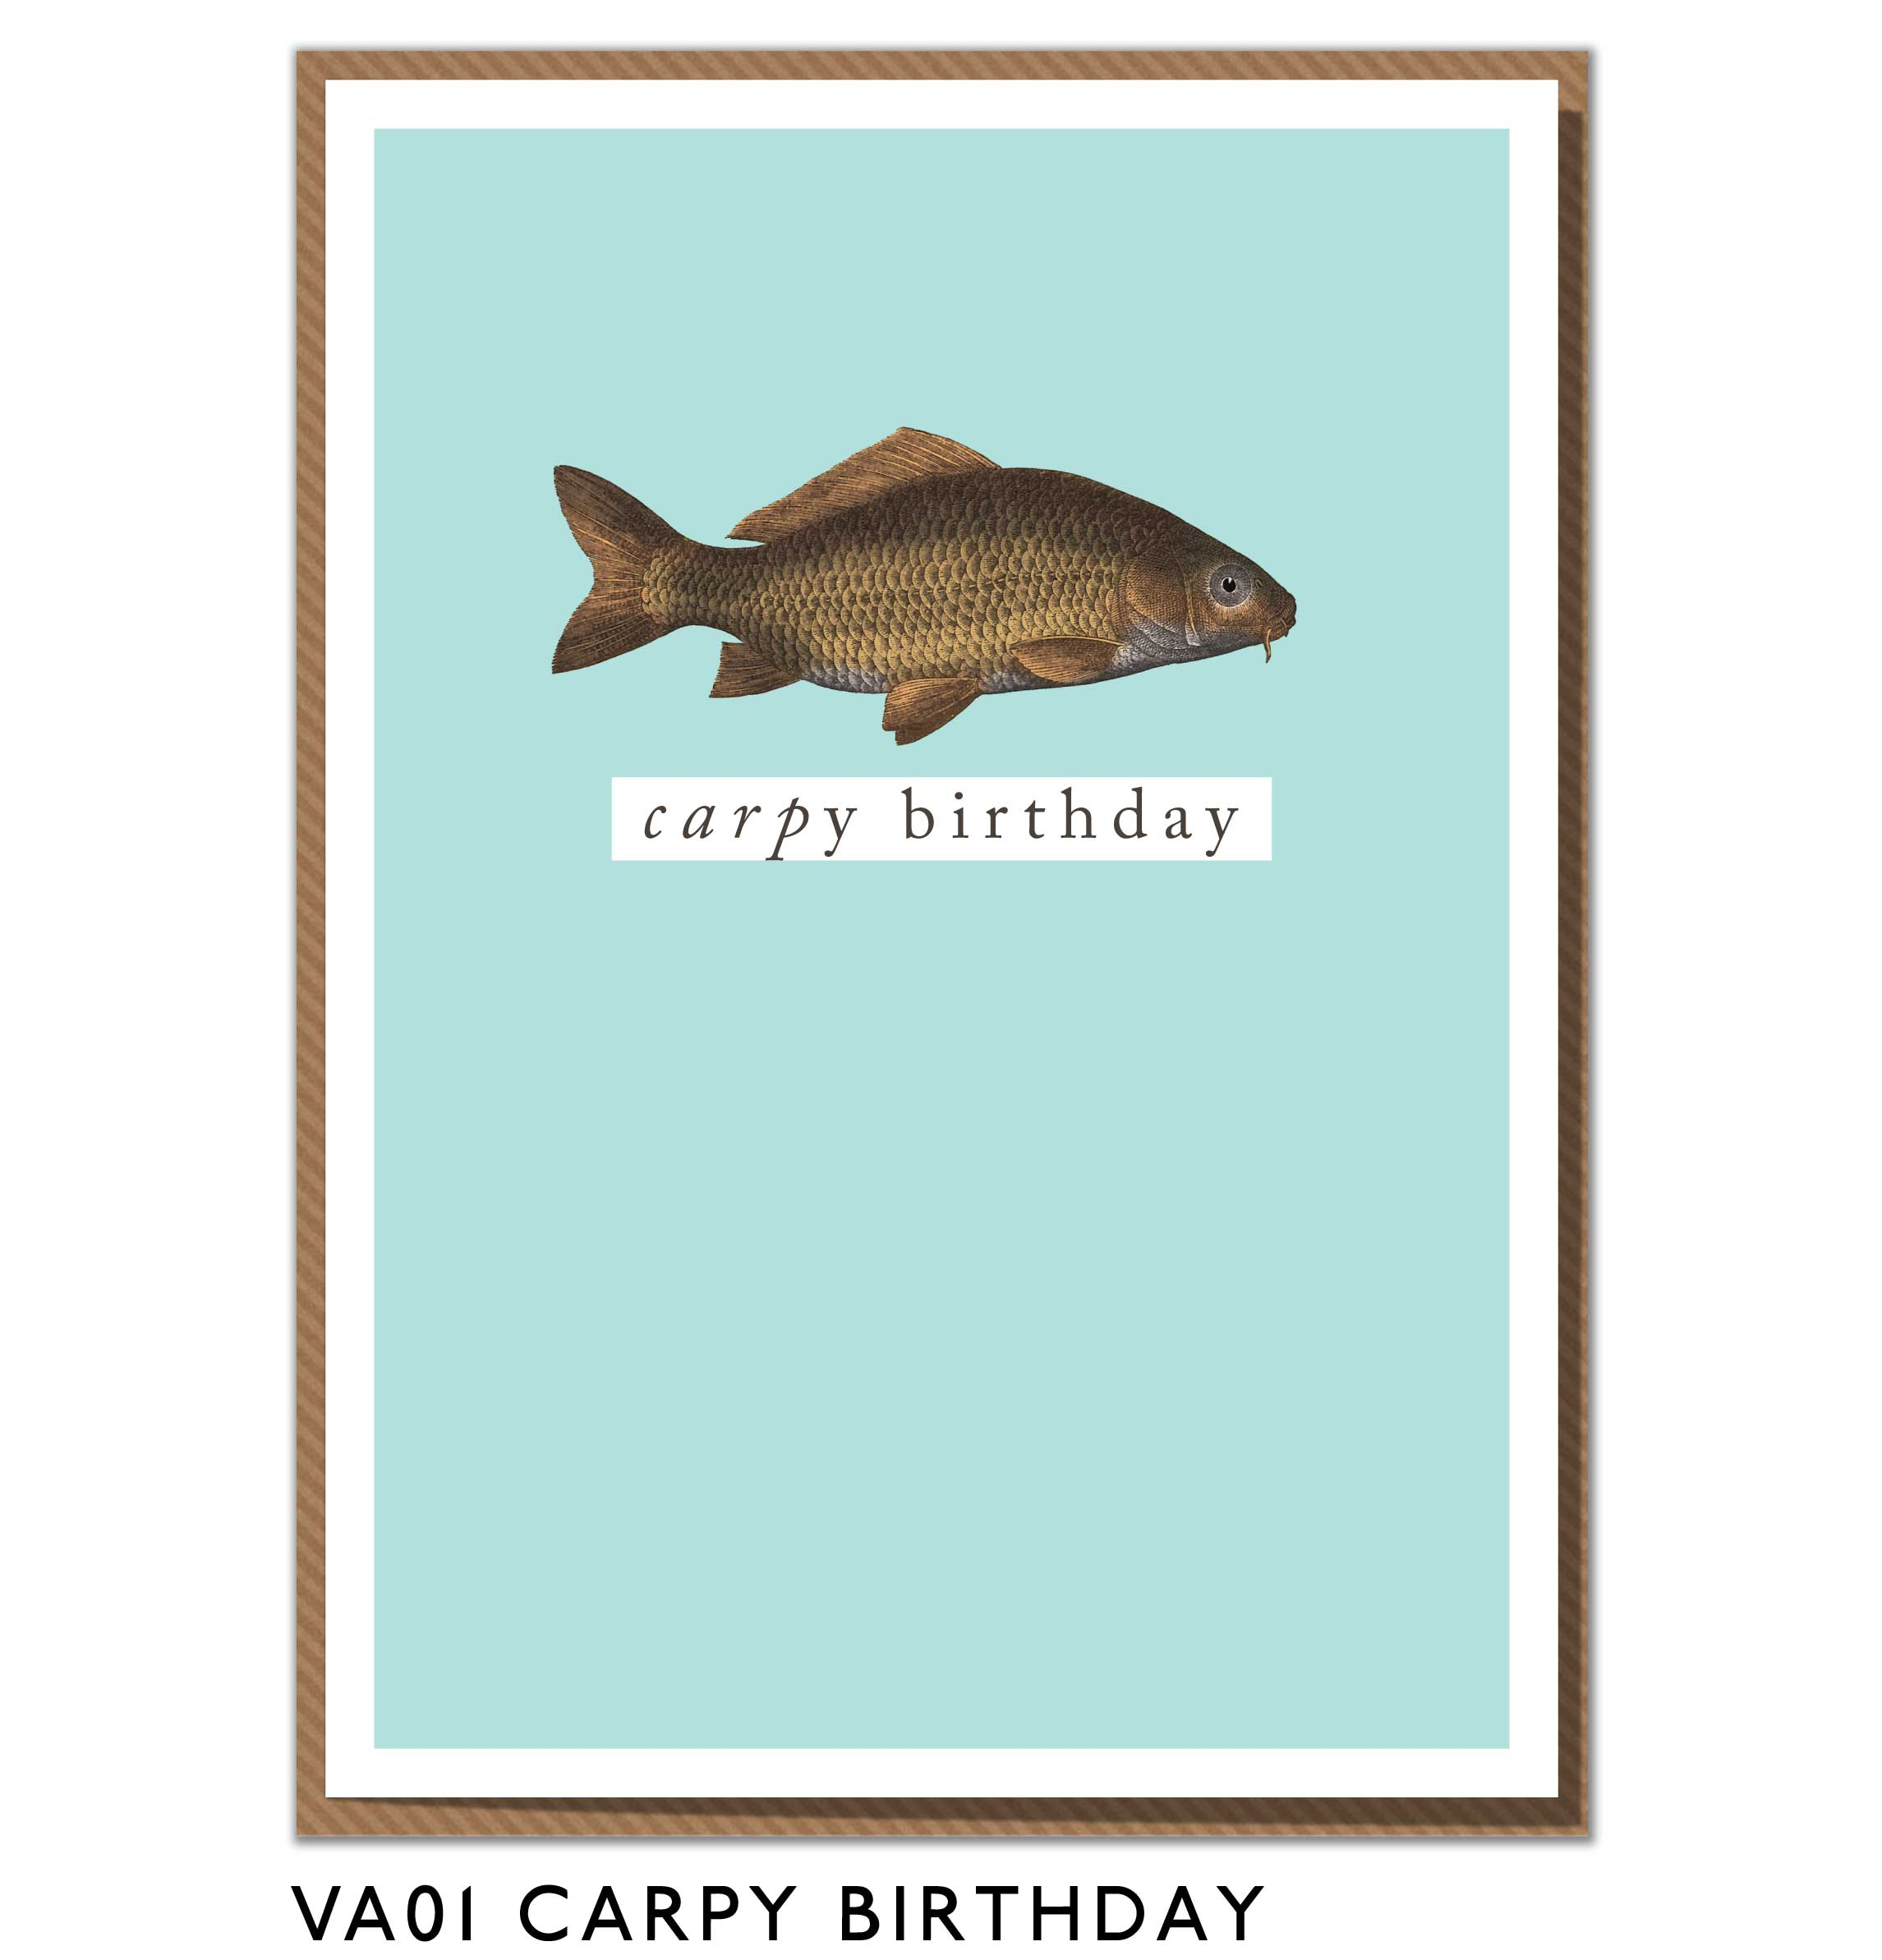 VA01-CARPY-BIRTHDAY.jpg